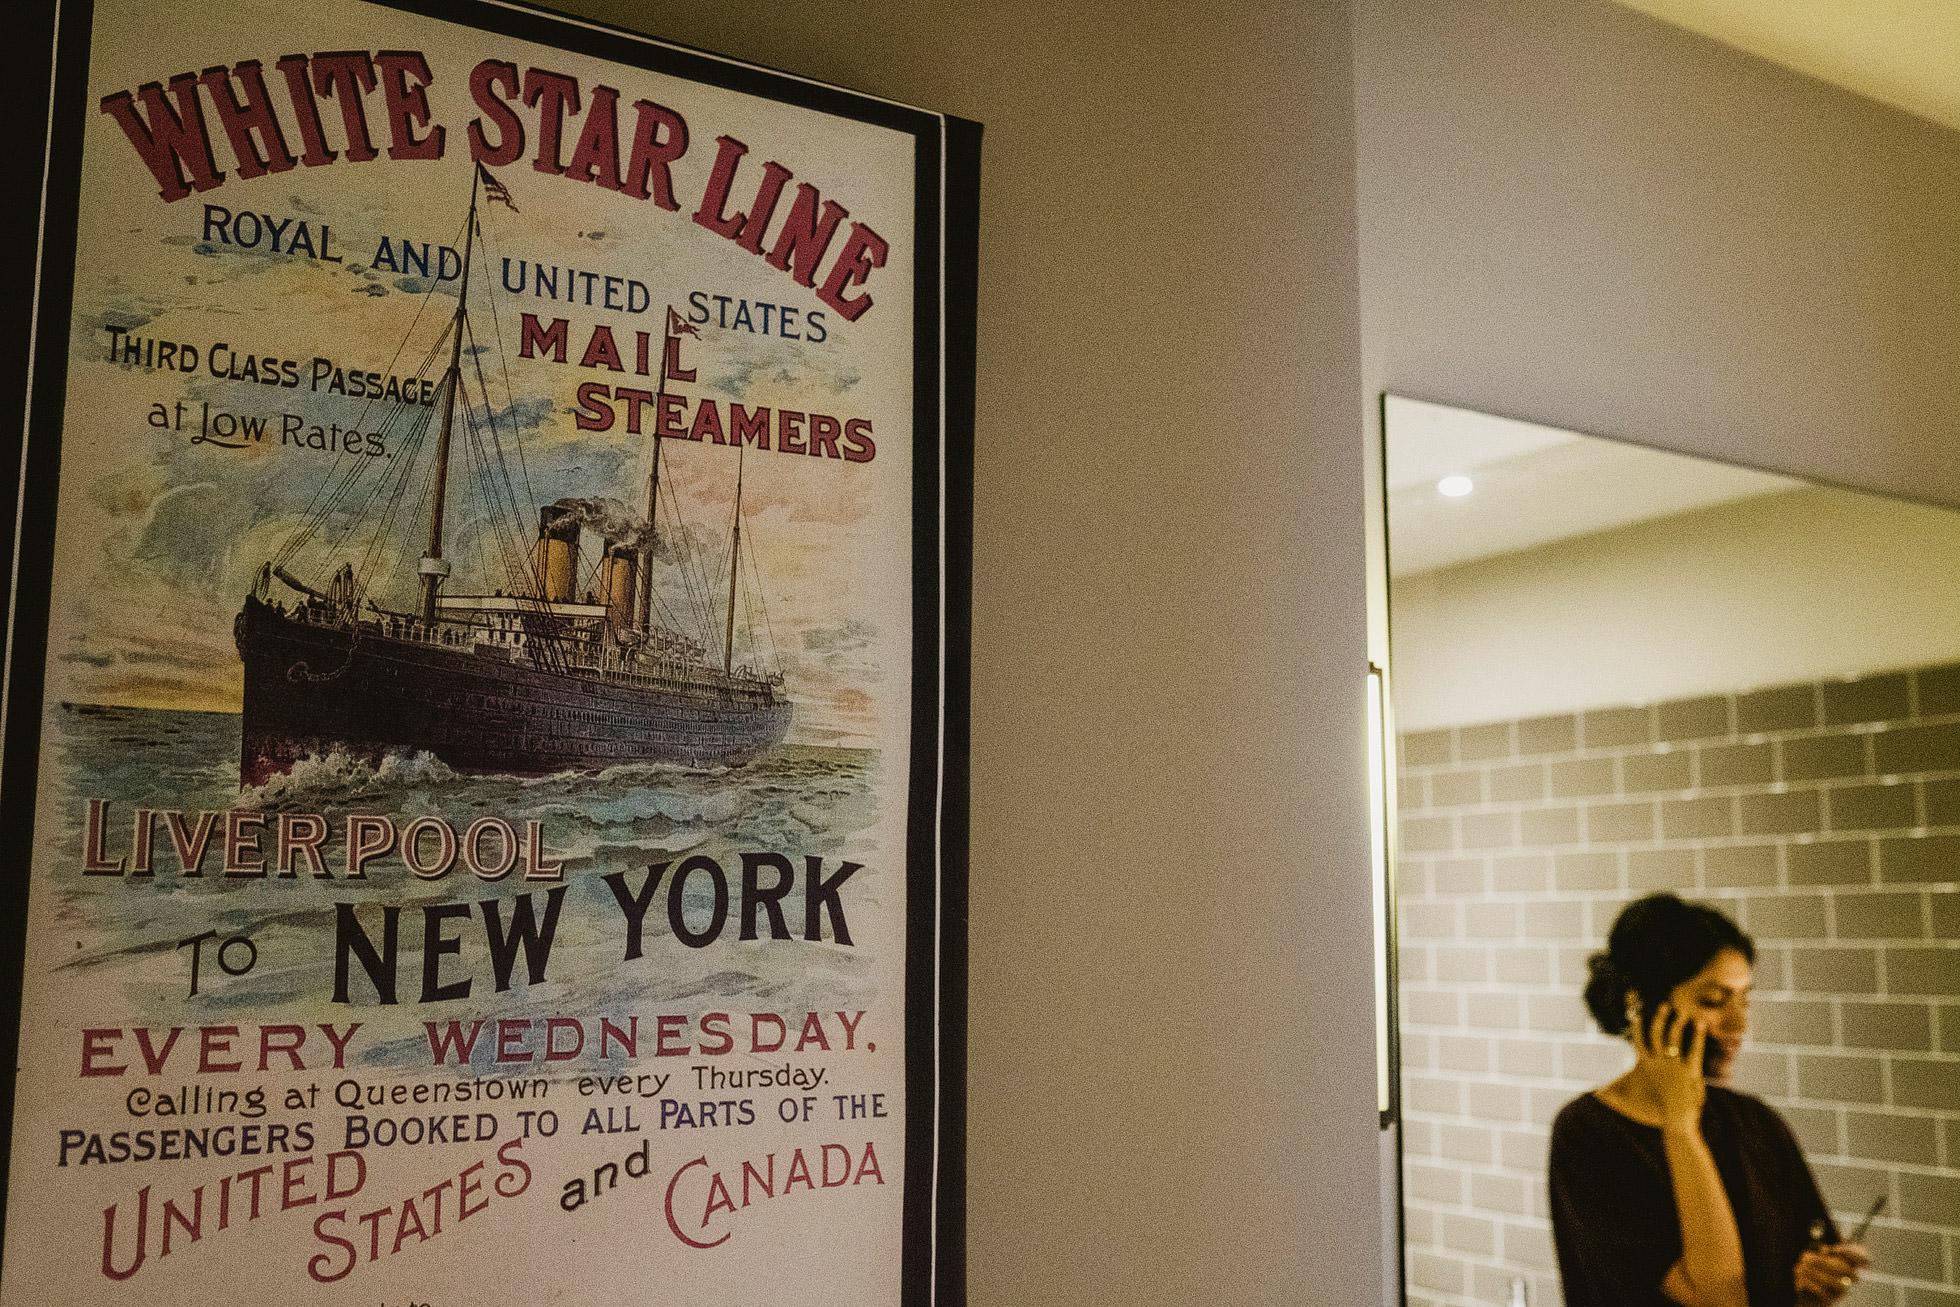 Titanic Hotel Liverpool